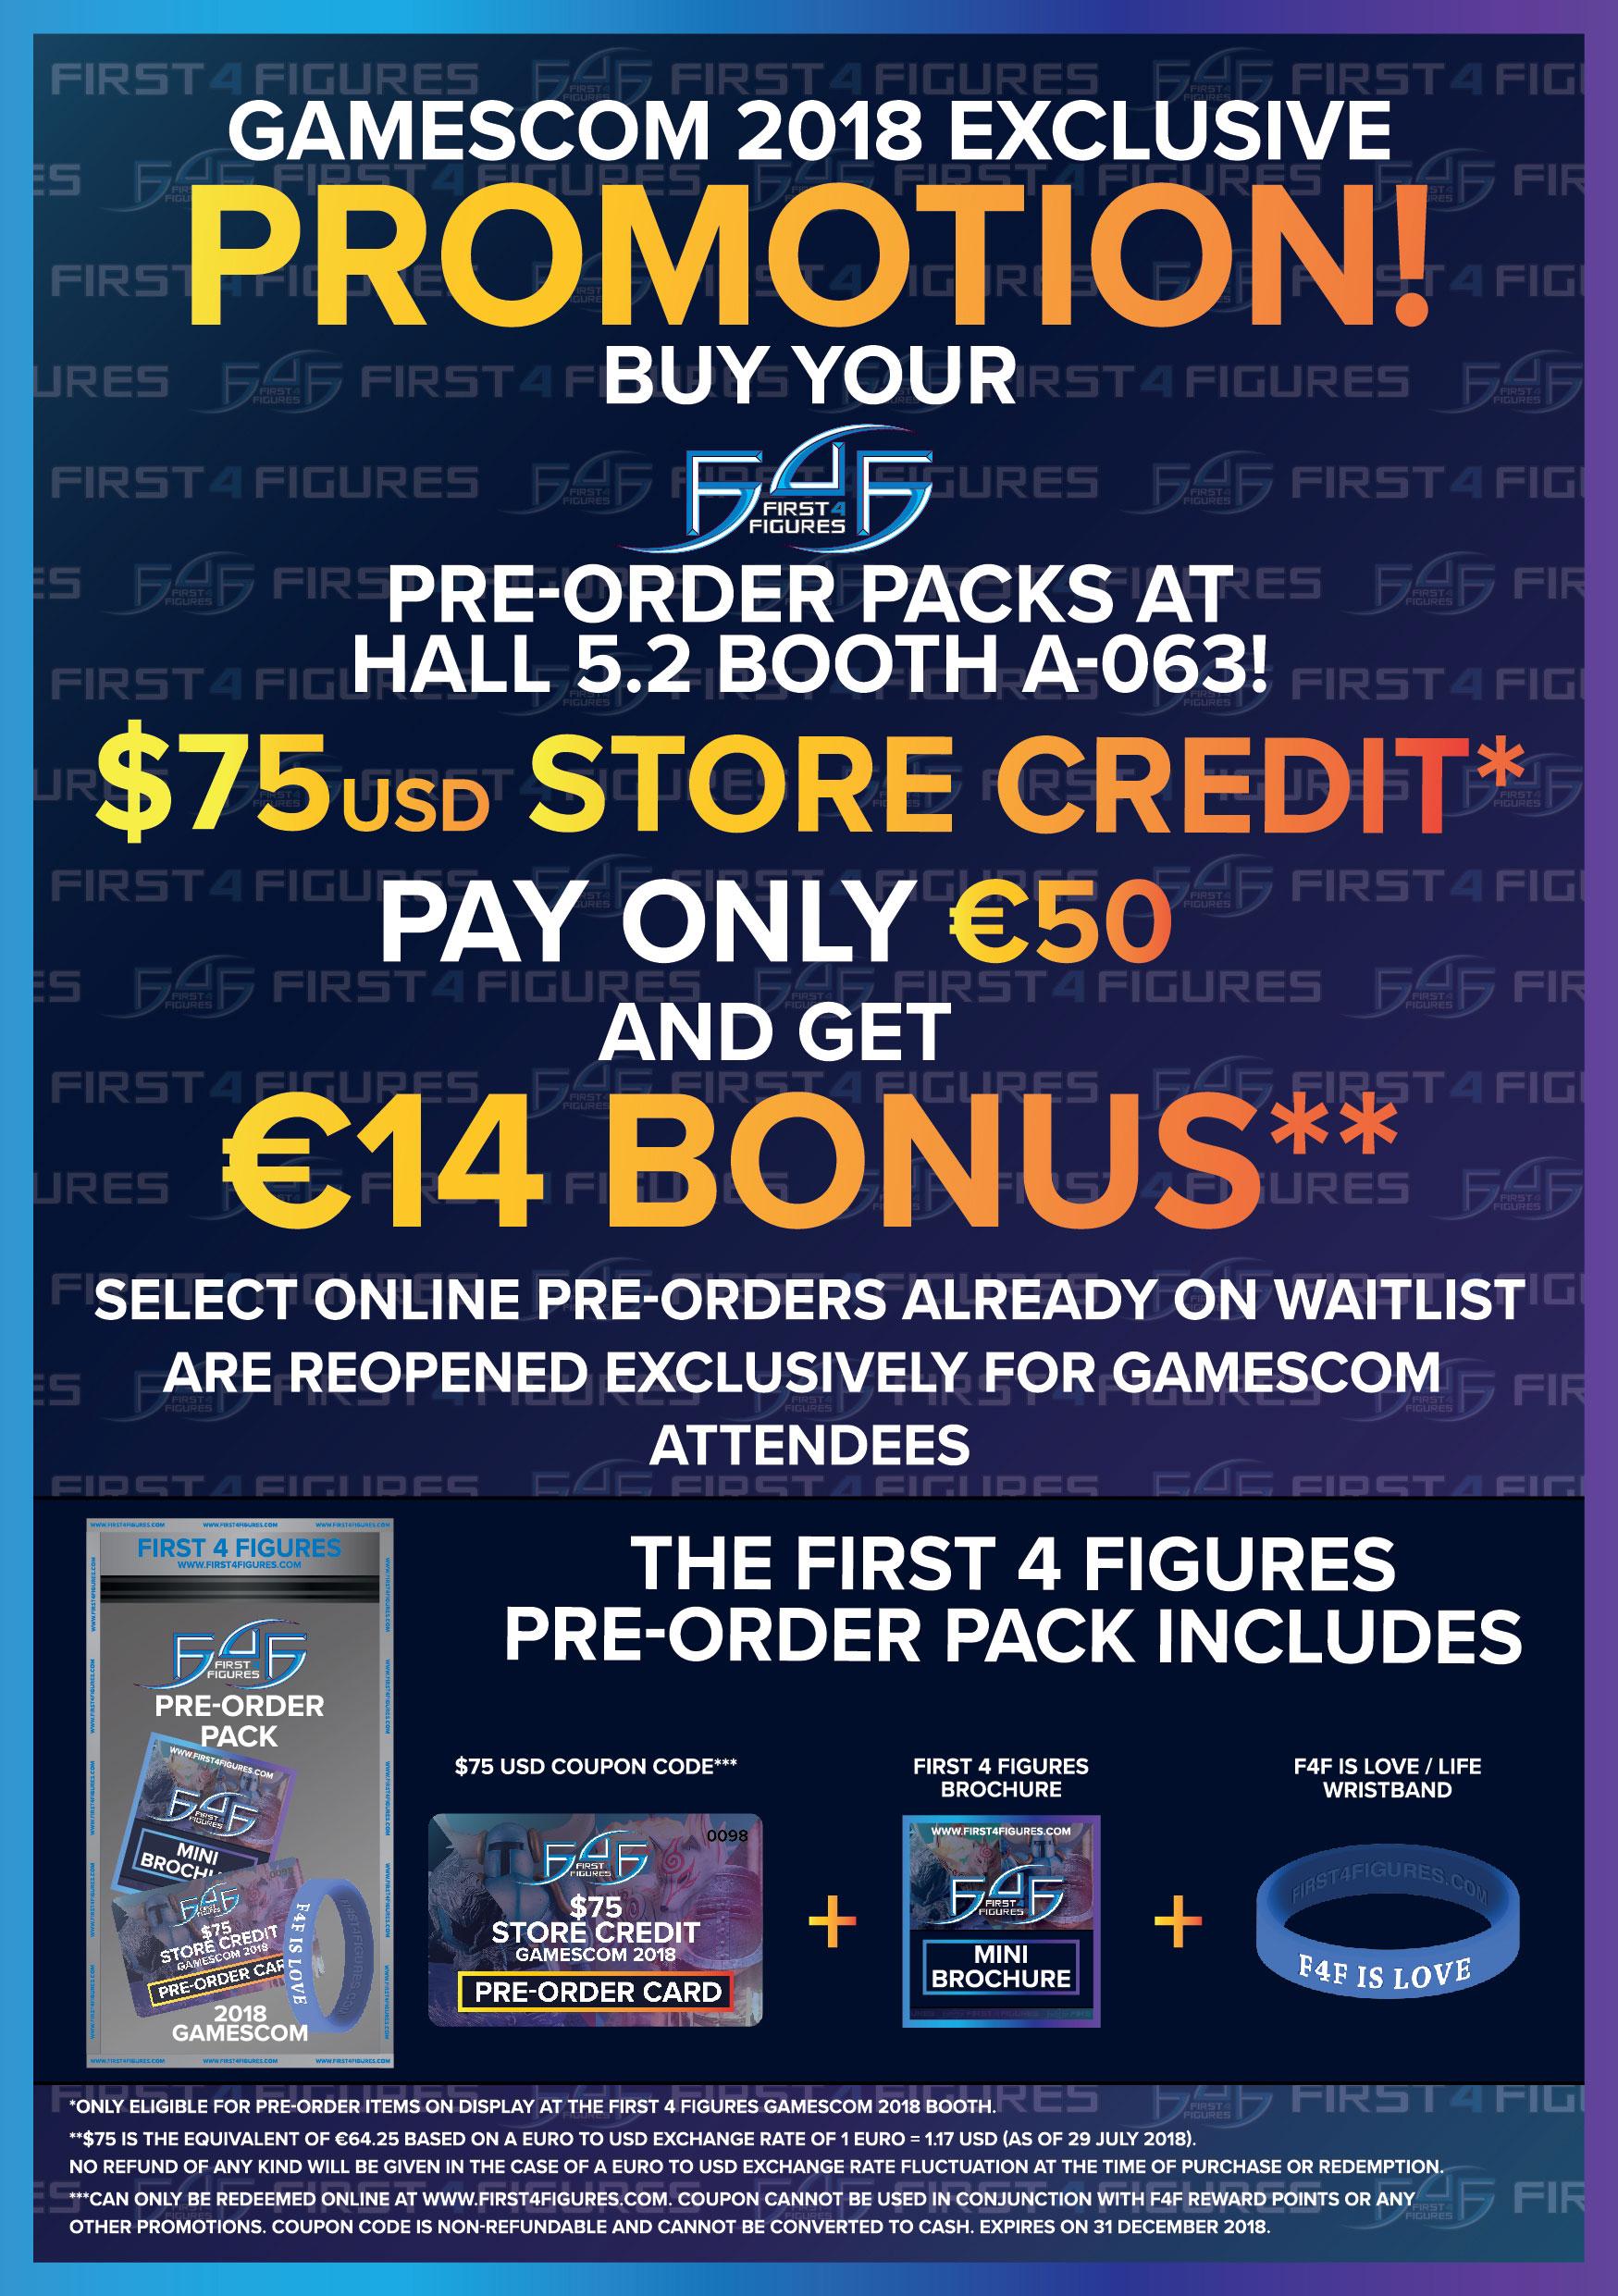 Gamescom 2018 F4F flyer (English)